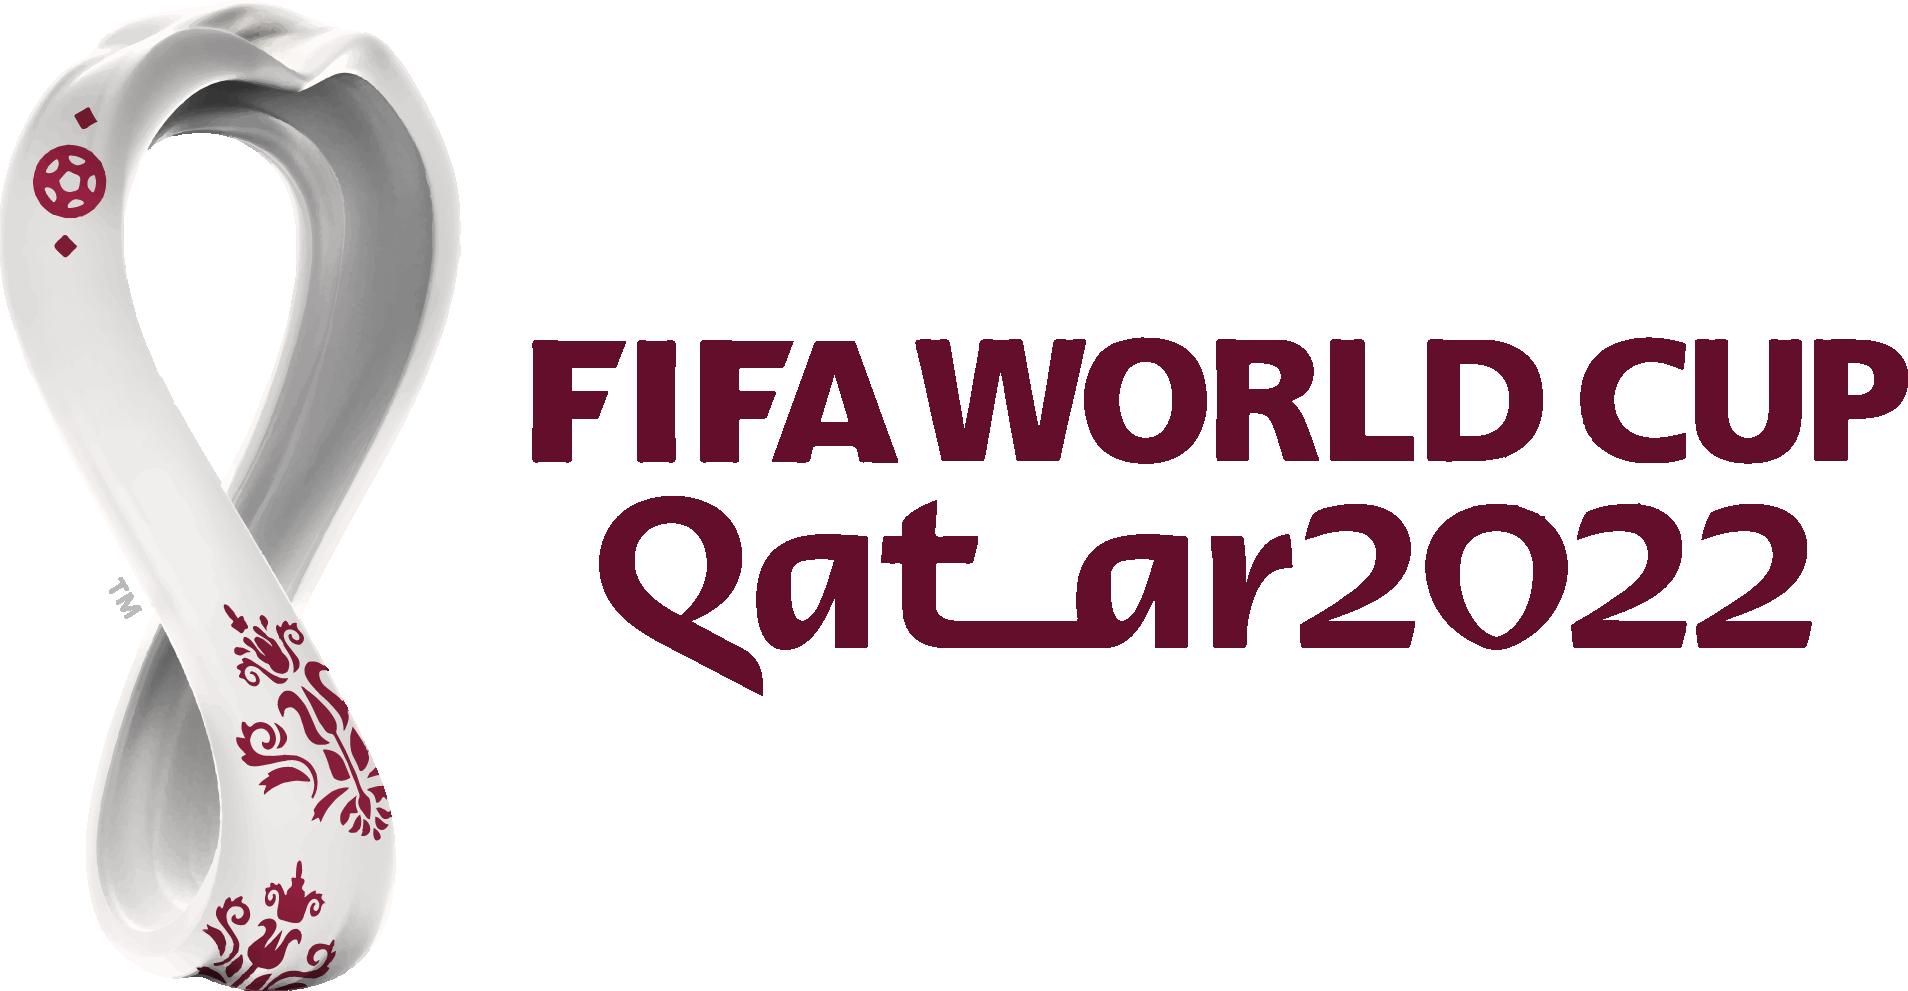 Qatar 2022 Logo Fifa World Cup Png Image Fifa World Cup Fifa World Cup